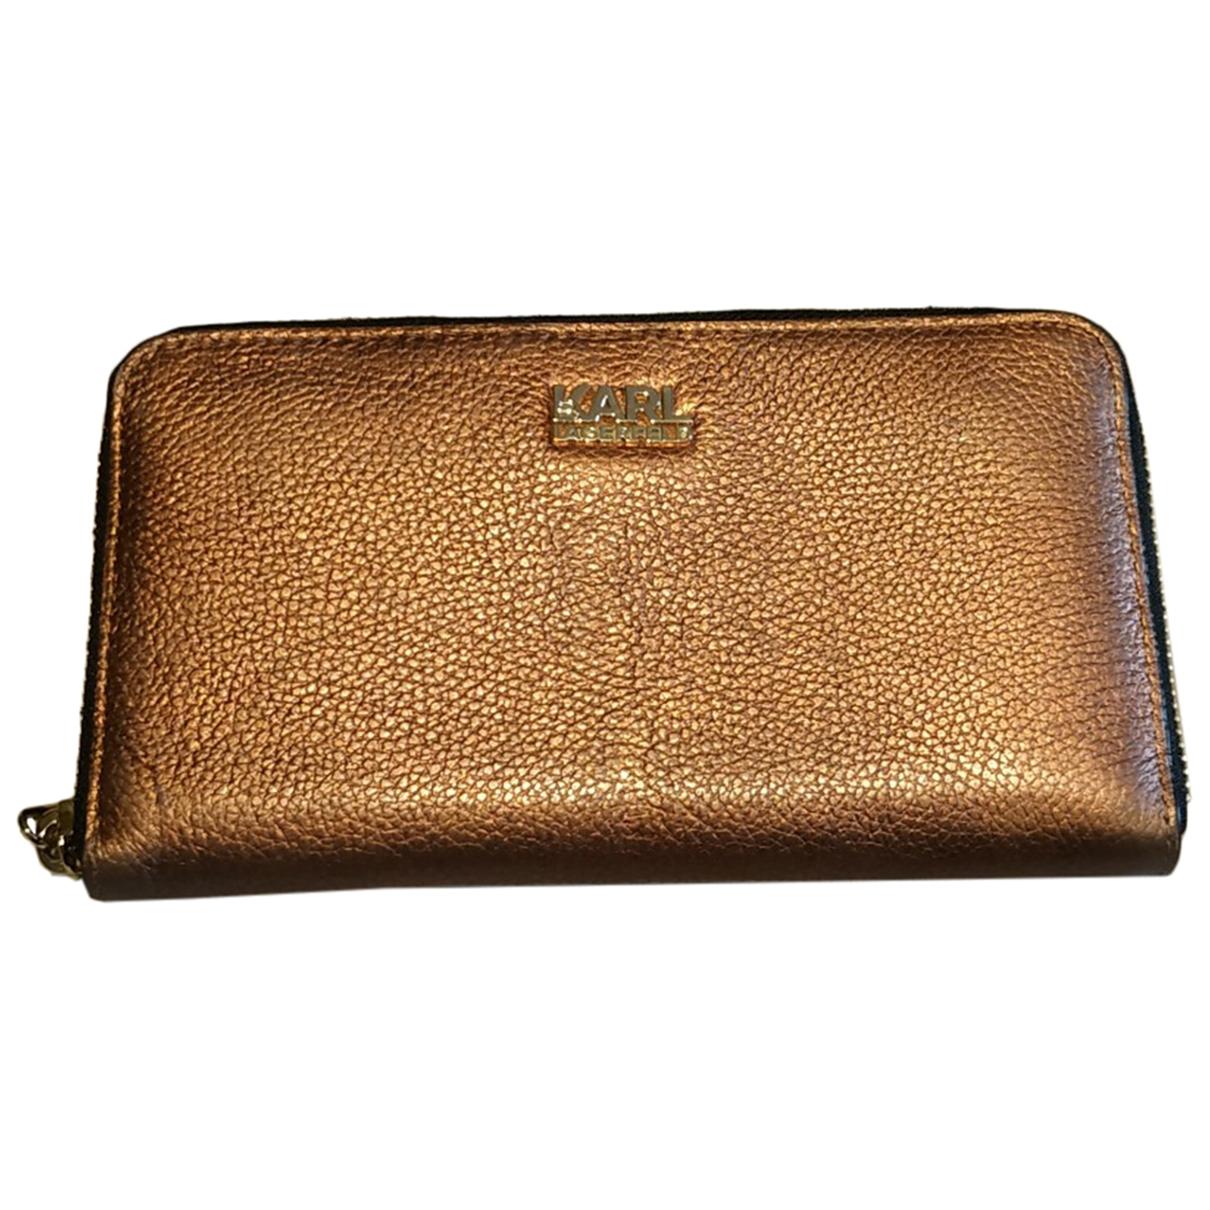 Karl Lagerfeld \N Metallic Leather wallet for Women \N